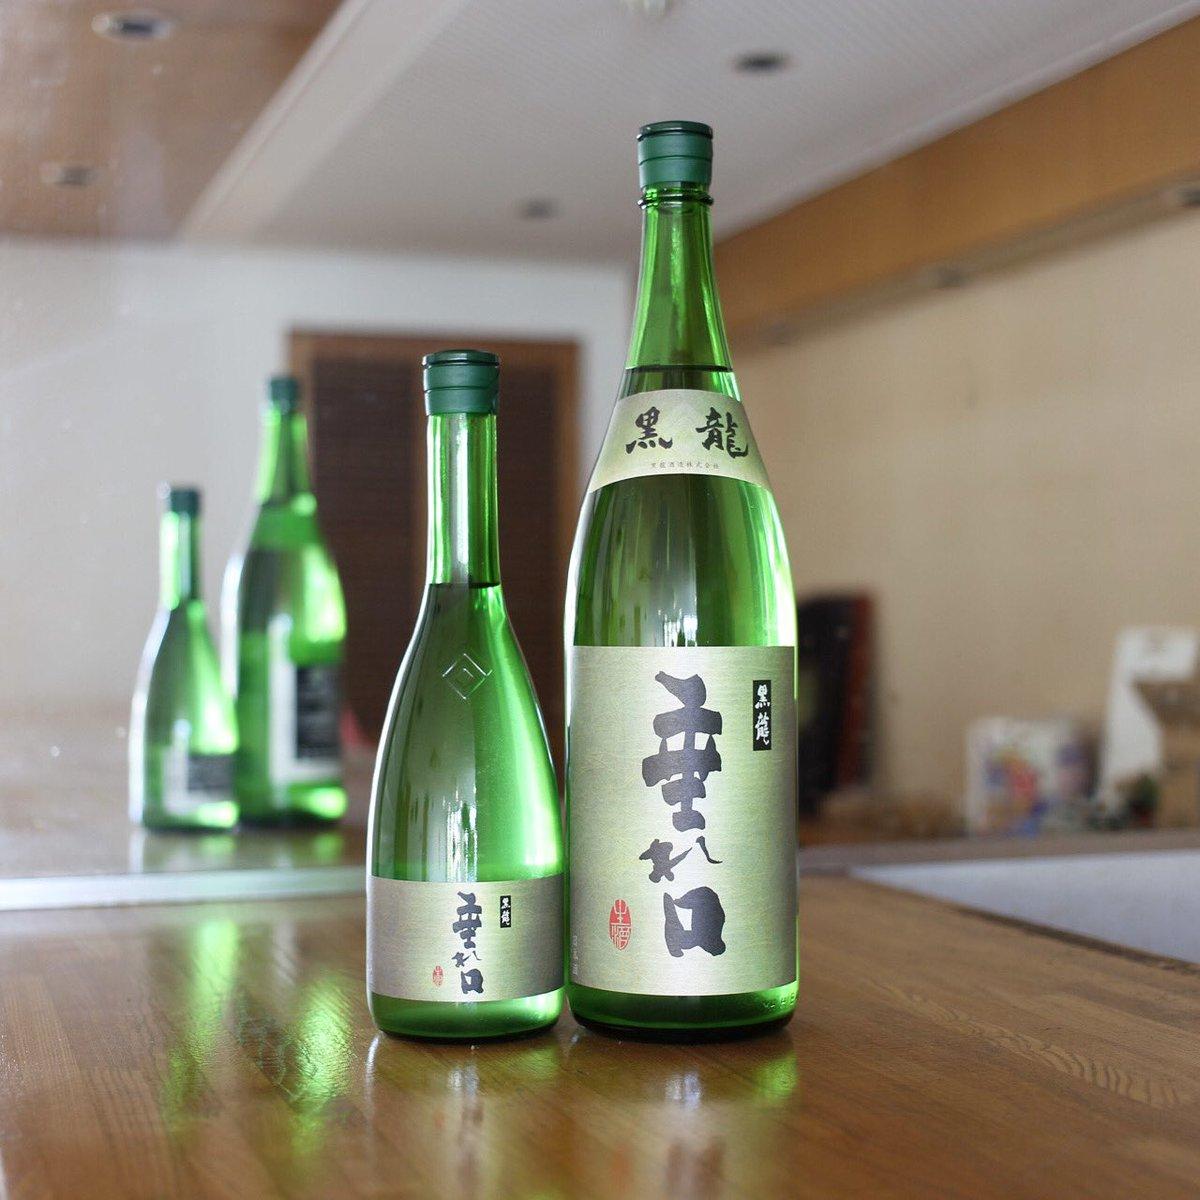 test ツイッターメディア - 黒龍新酒垂れ口! 福井県の黒龍酒造さんから新酒の垂れ口が届きました。滴り落ちるしぼりたてのお酒を即瓶に詰め出荷。鮮度抜群のお酒です。優しい甘みがたまりません!今年の『垂れ口』ぜひ楽しんでくださいな!  1.8L  2640円  720ml 1265円(税込)  #黒龍 #垂れ口 #黒龍垂れ口 #地酒 #sake #日本酒 https://t.co/woFhskoI6y